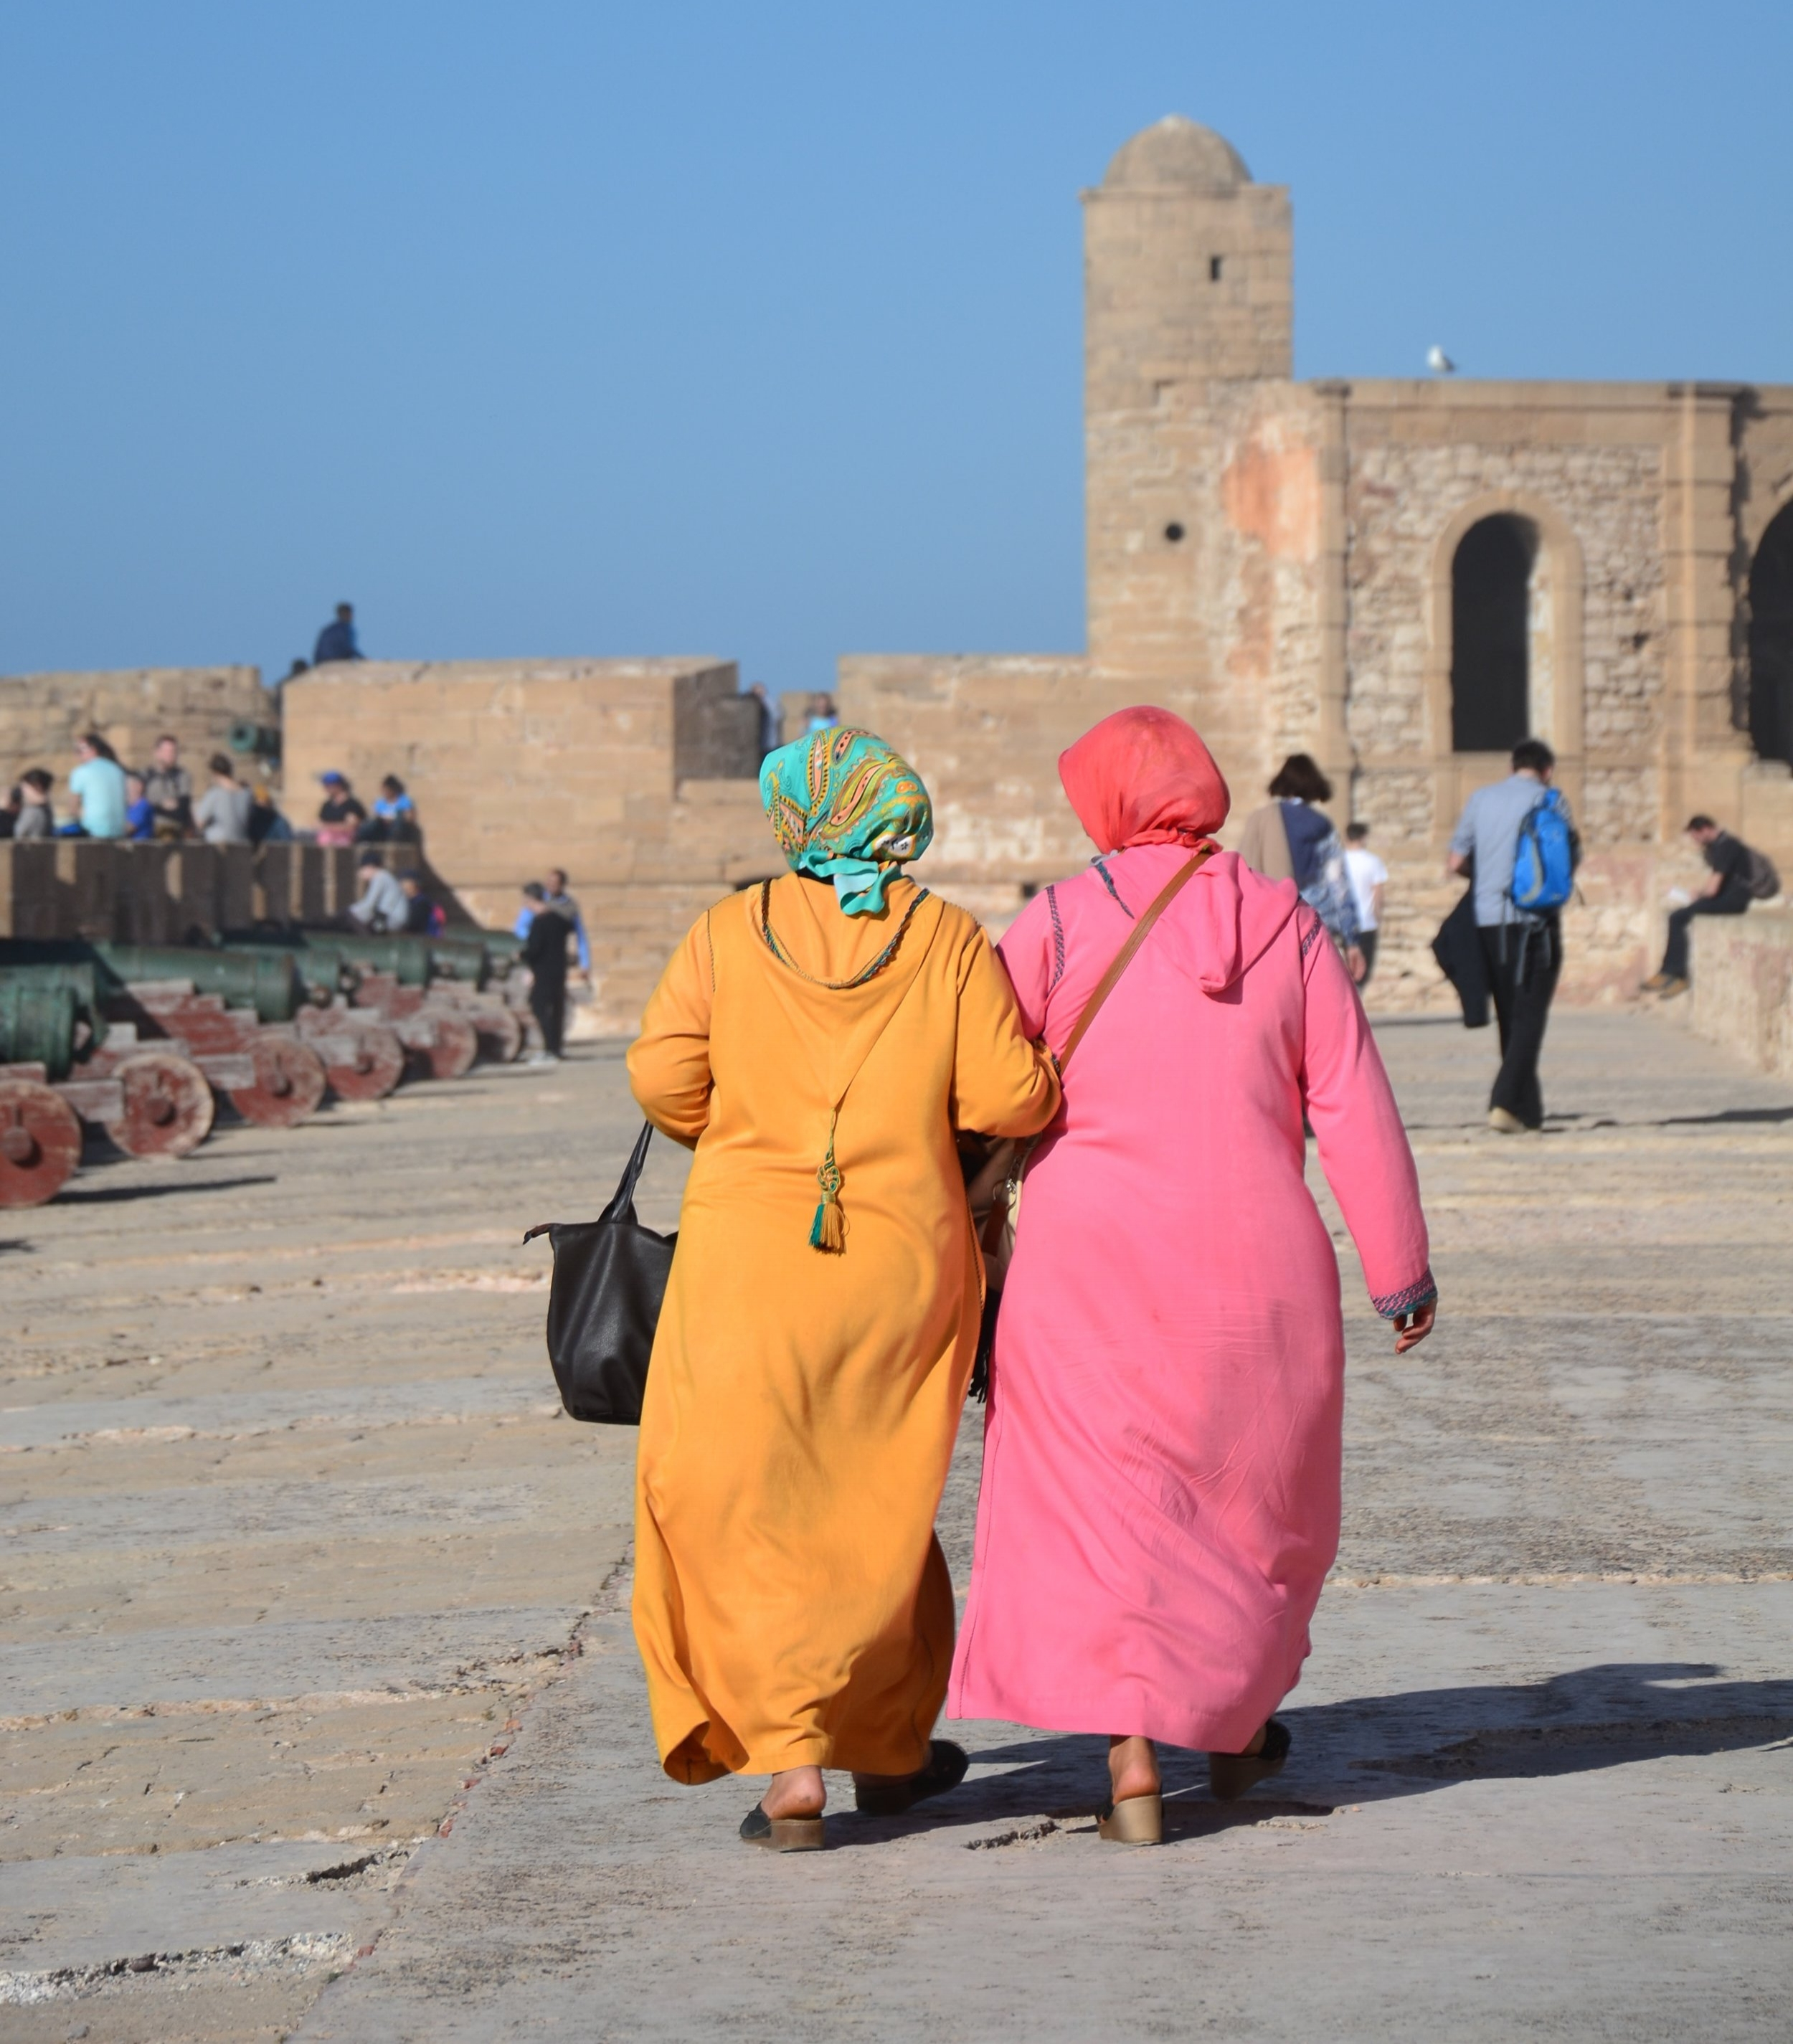 Essaouira, Morocco Photo by  Melvina Mak  on  Unsplash